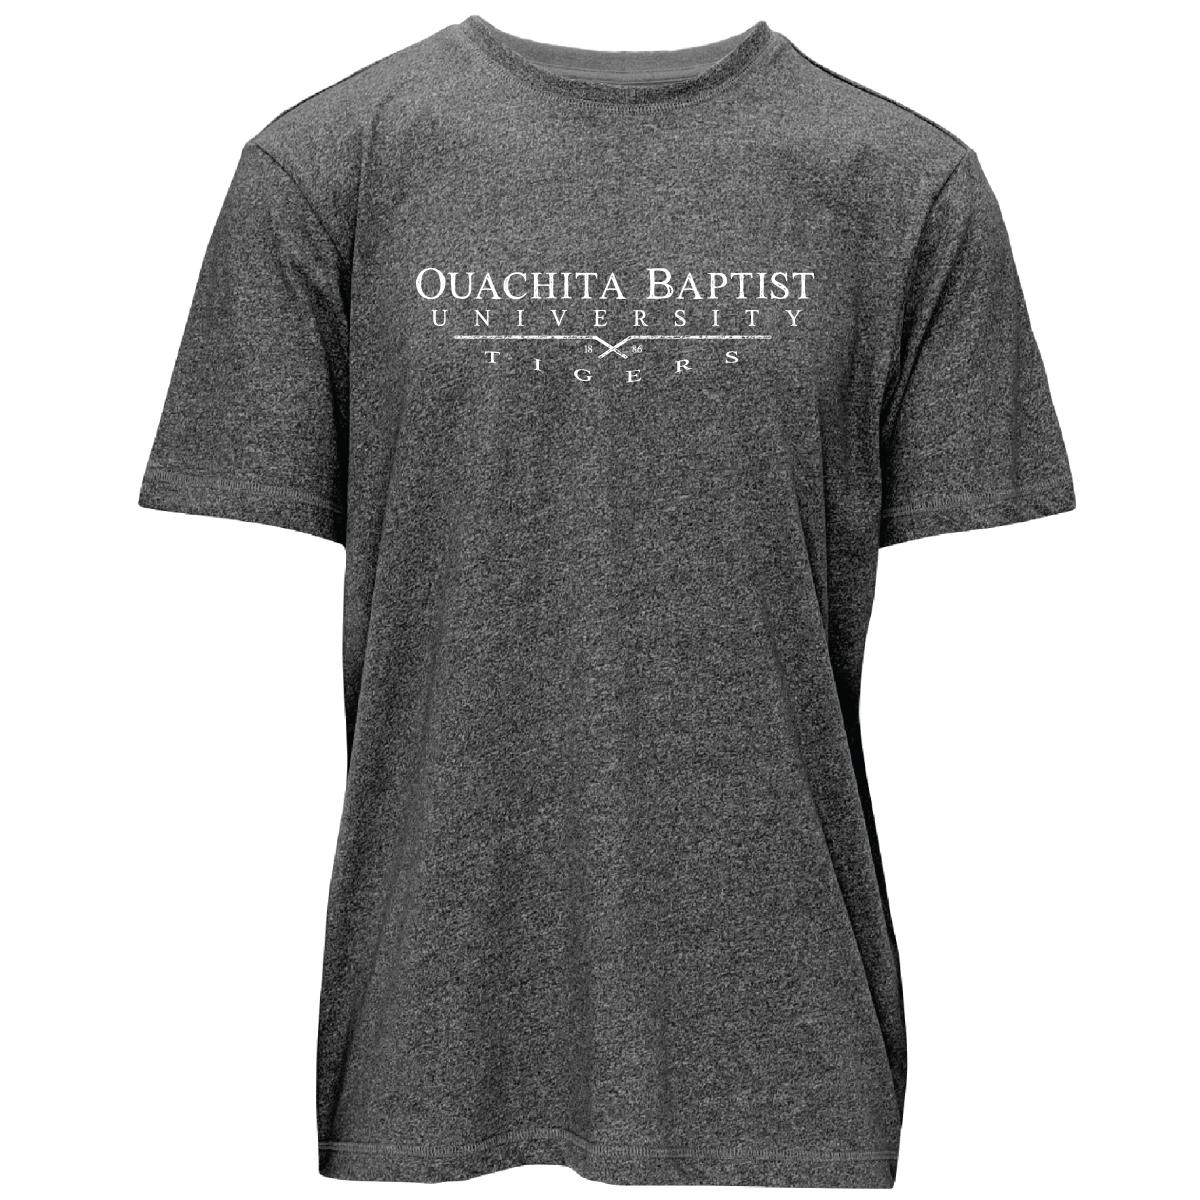 OUACHITA BAPTIST UNIVERSITY TIGERS 1886 COMEBACK TEE